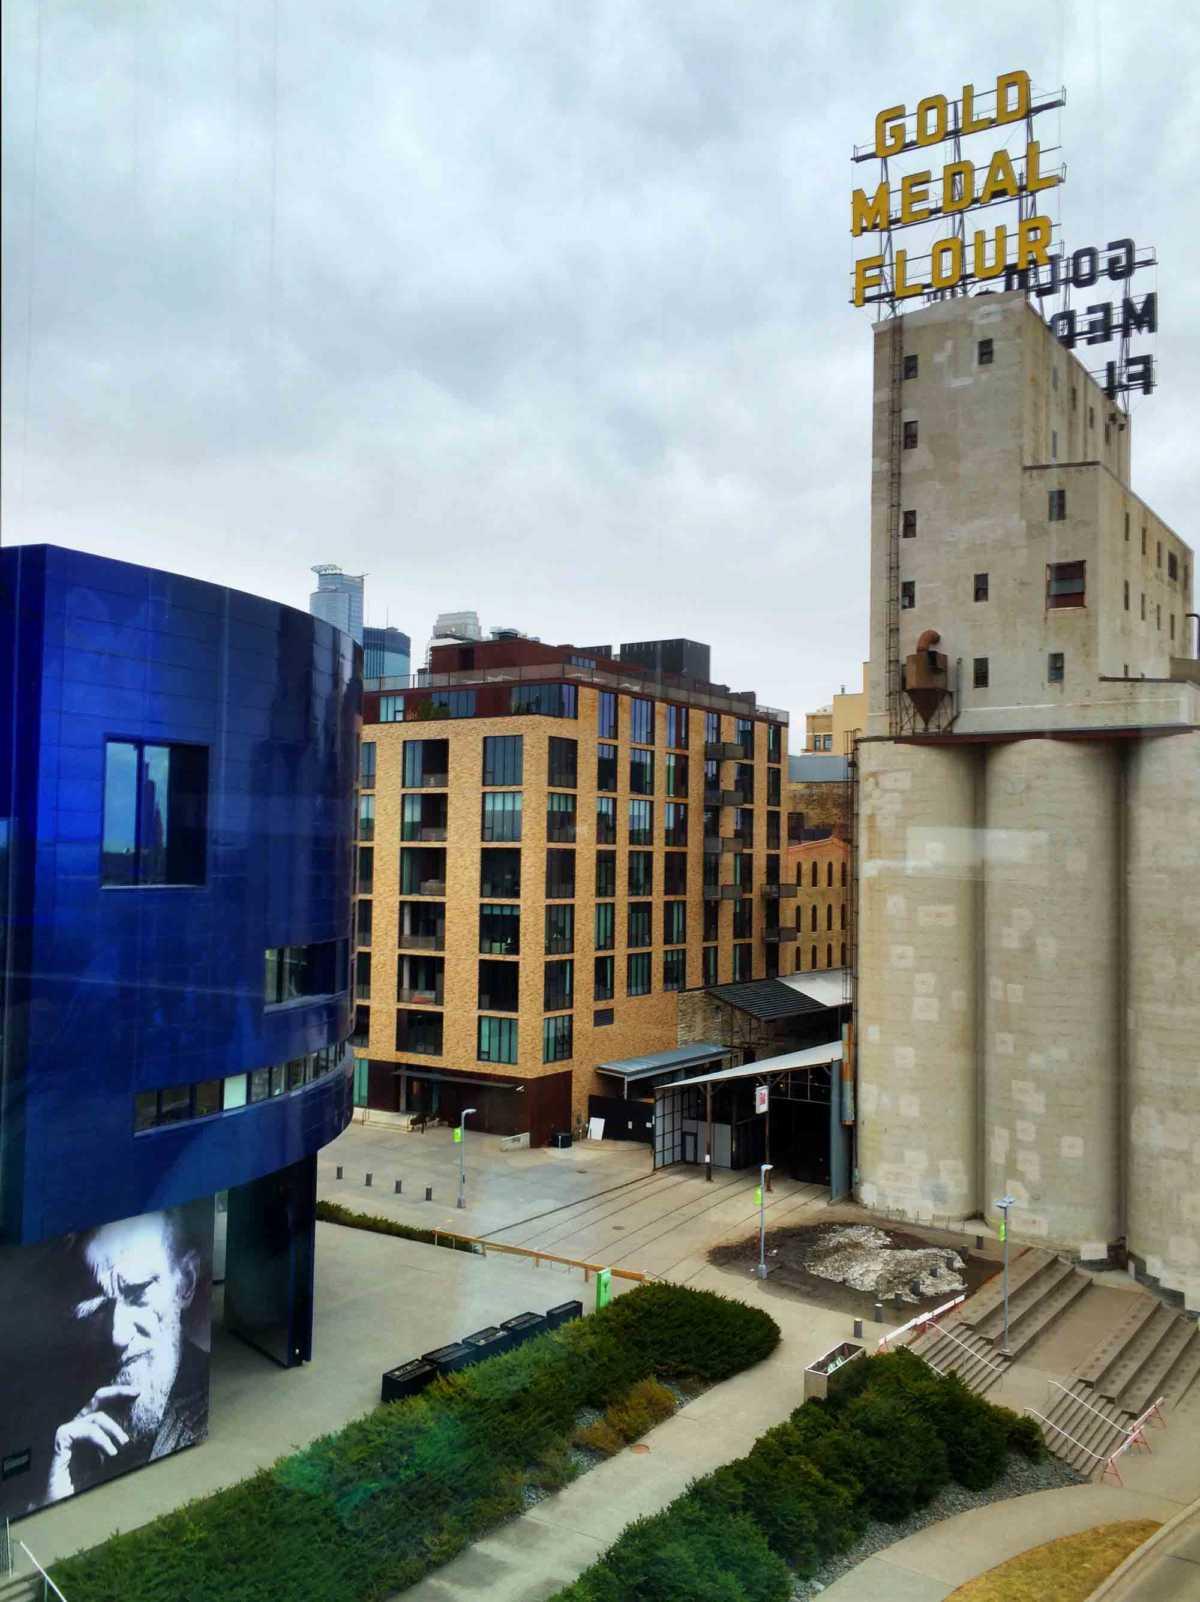 Minneapolis St. Paul